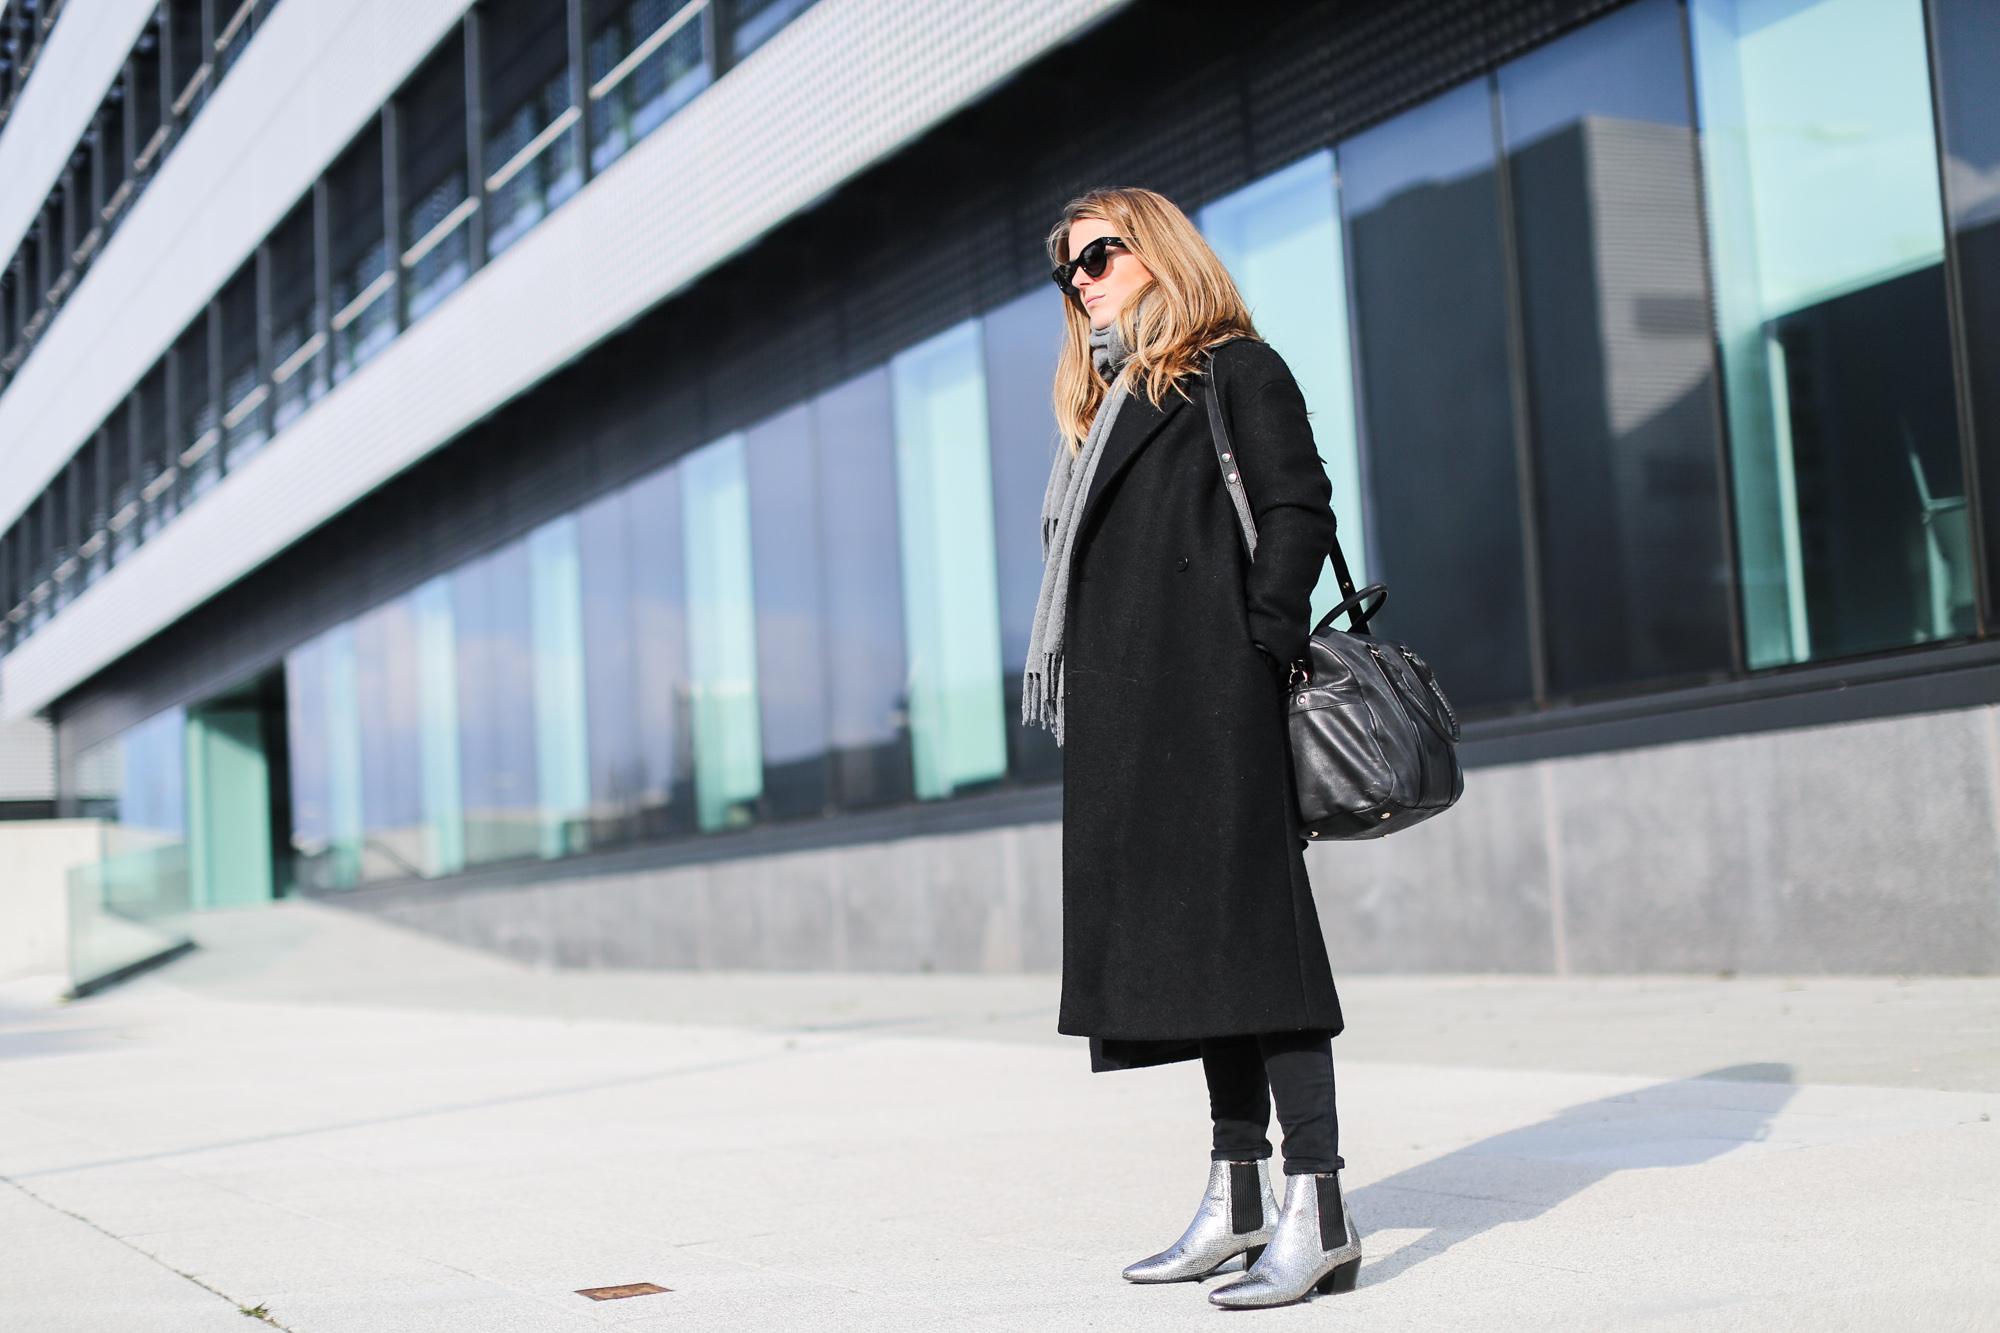 Clochet_streetstyle_fashionblogger_josefinabags_cosabrigolargolana_botinespielplateadosMaje_bufandaAcneStudiosCanada